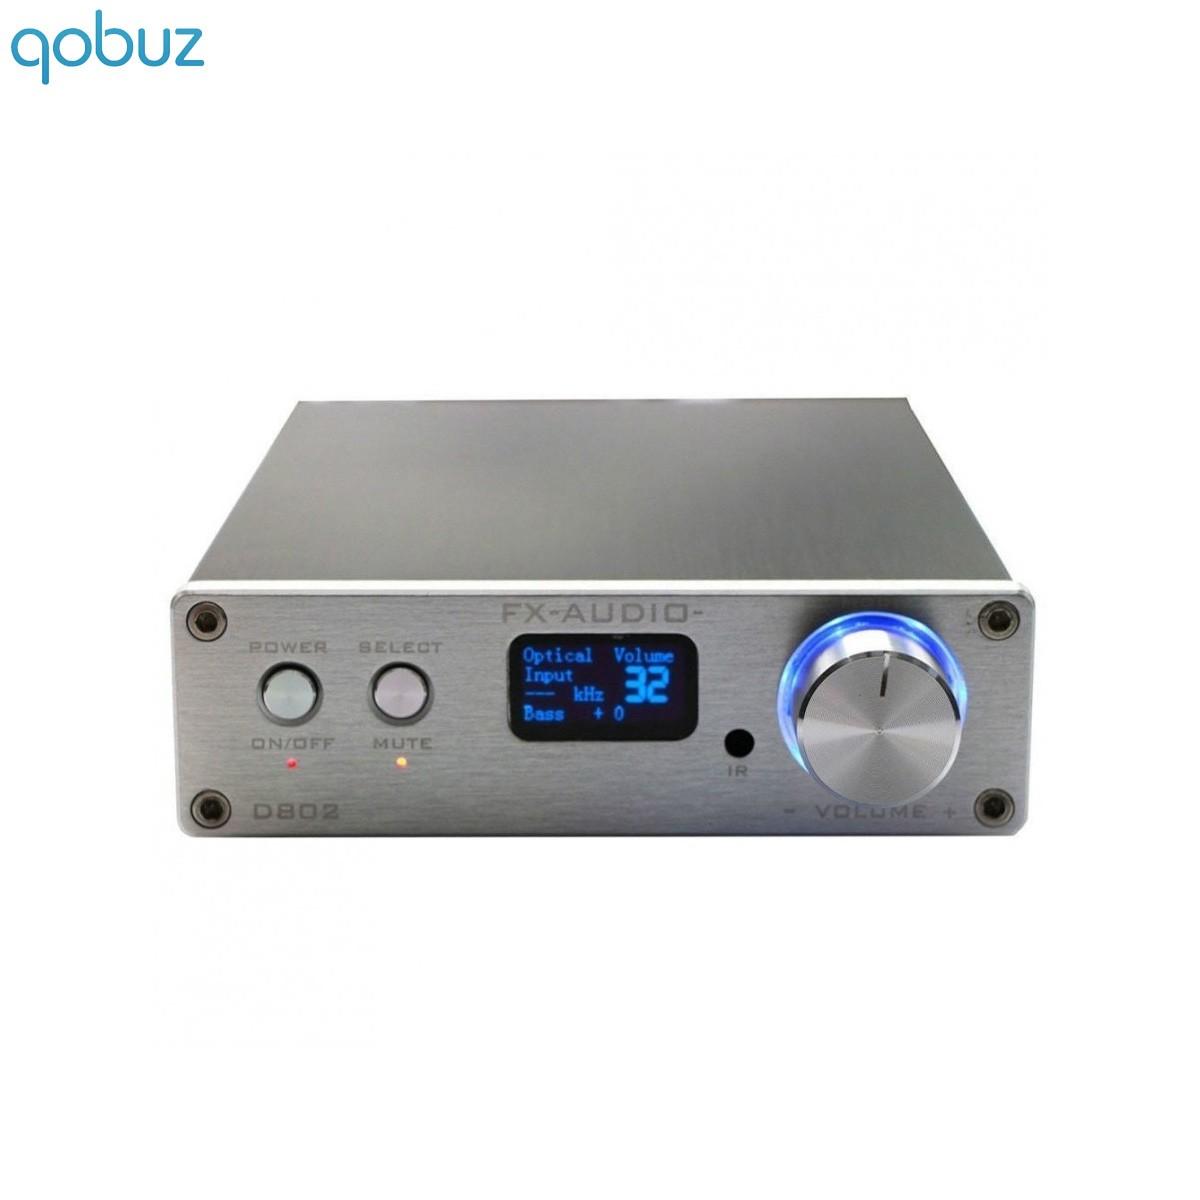 FX-AUDIO D802 Digital Amplifier STA326 Class D stereo 2x50W / 8 Ohm Silver